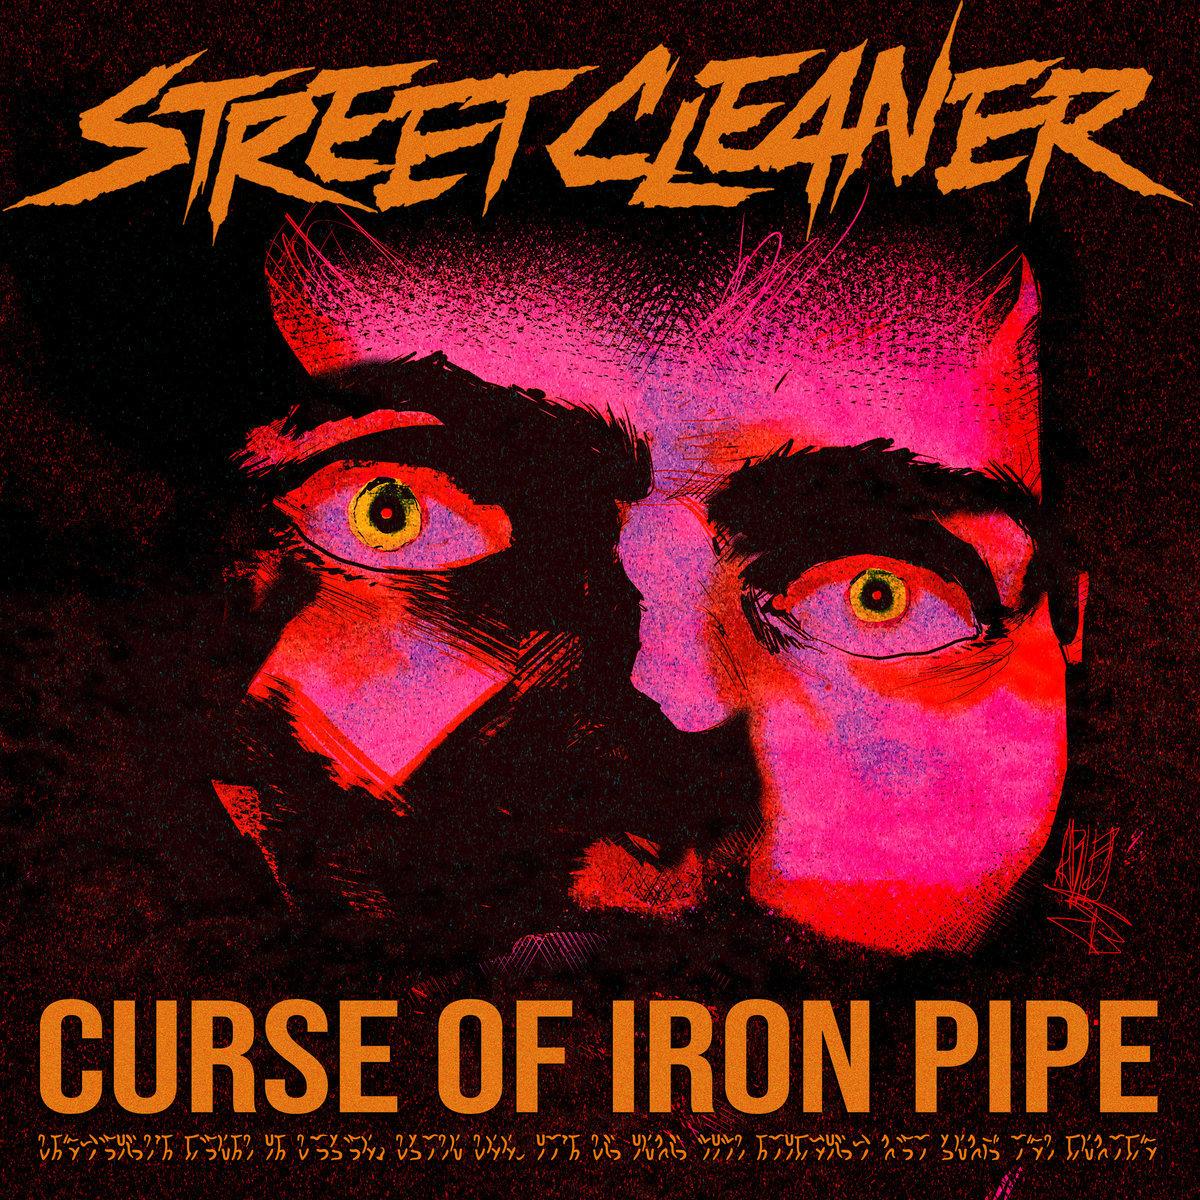 Street Cleaner,